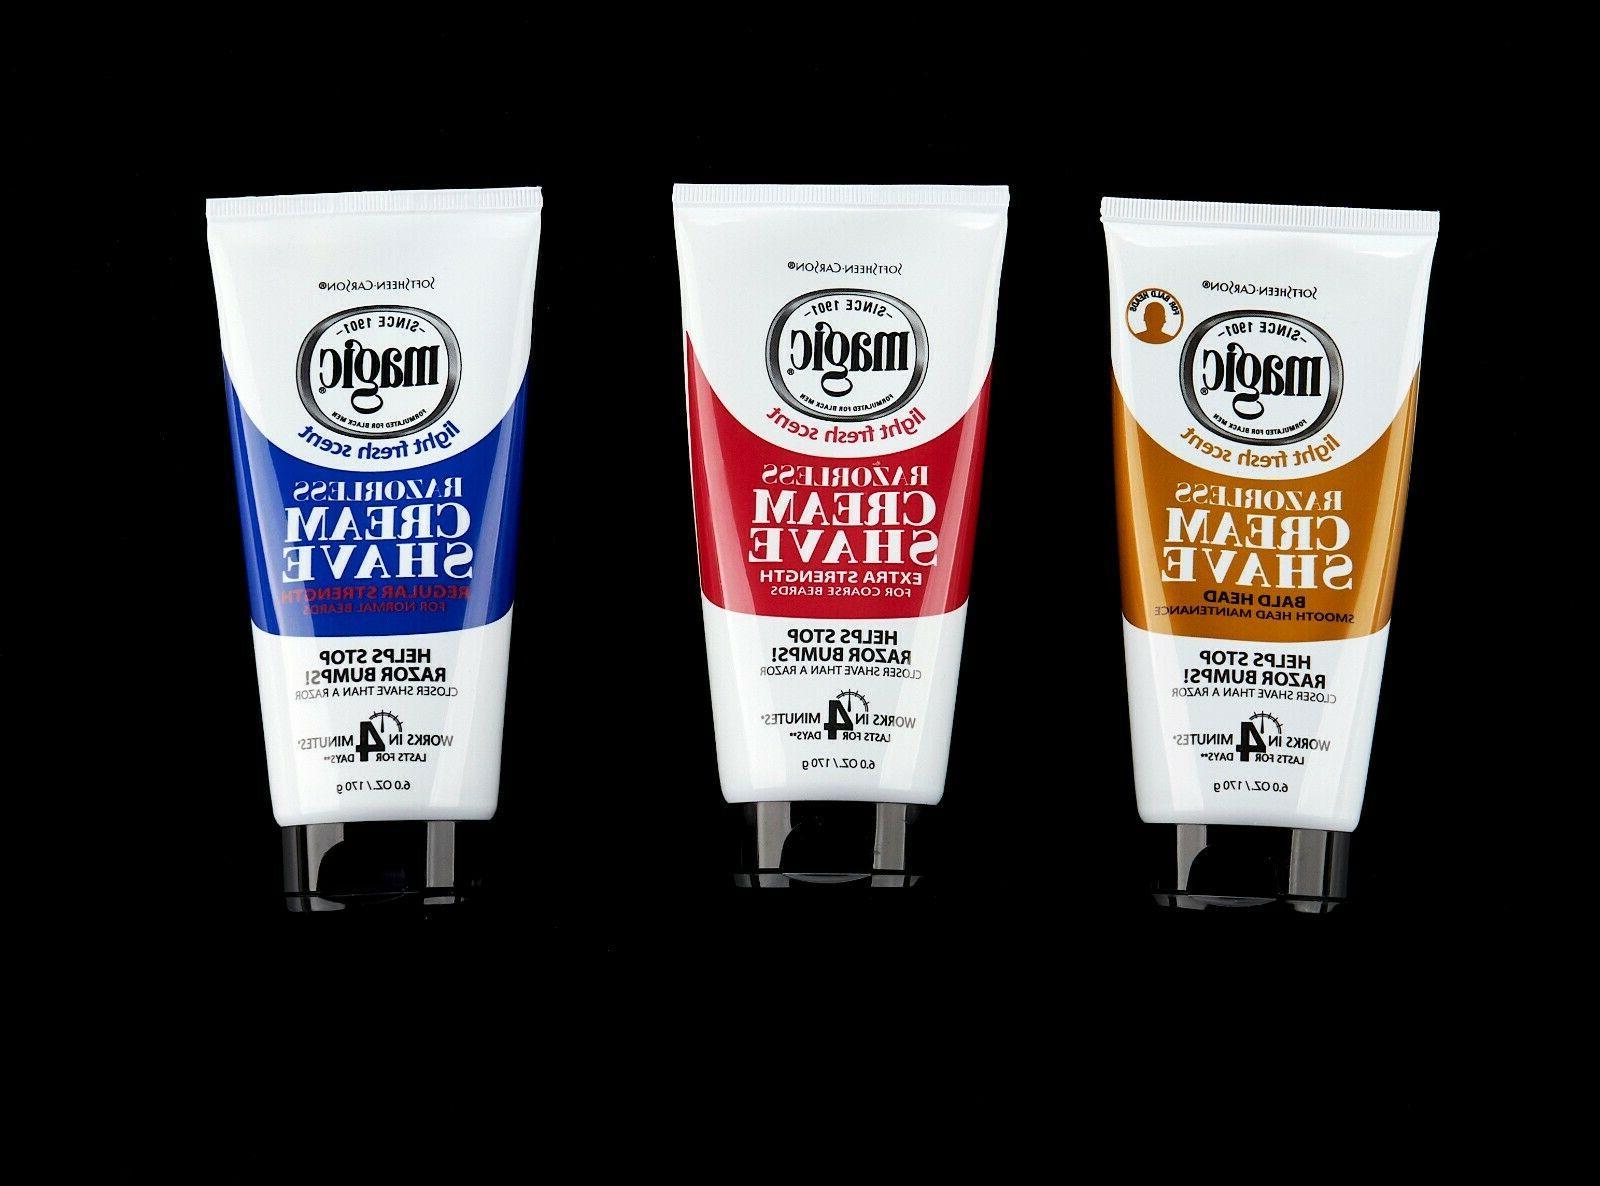 magic shaving cream by razorless hair removal